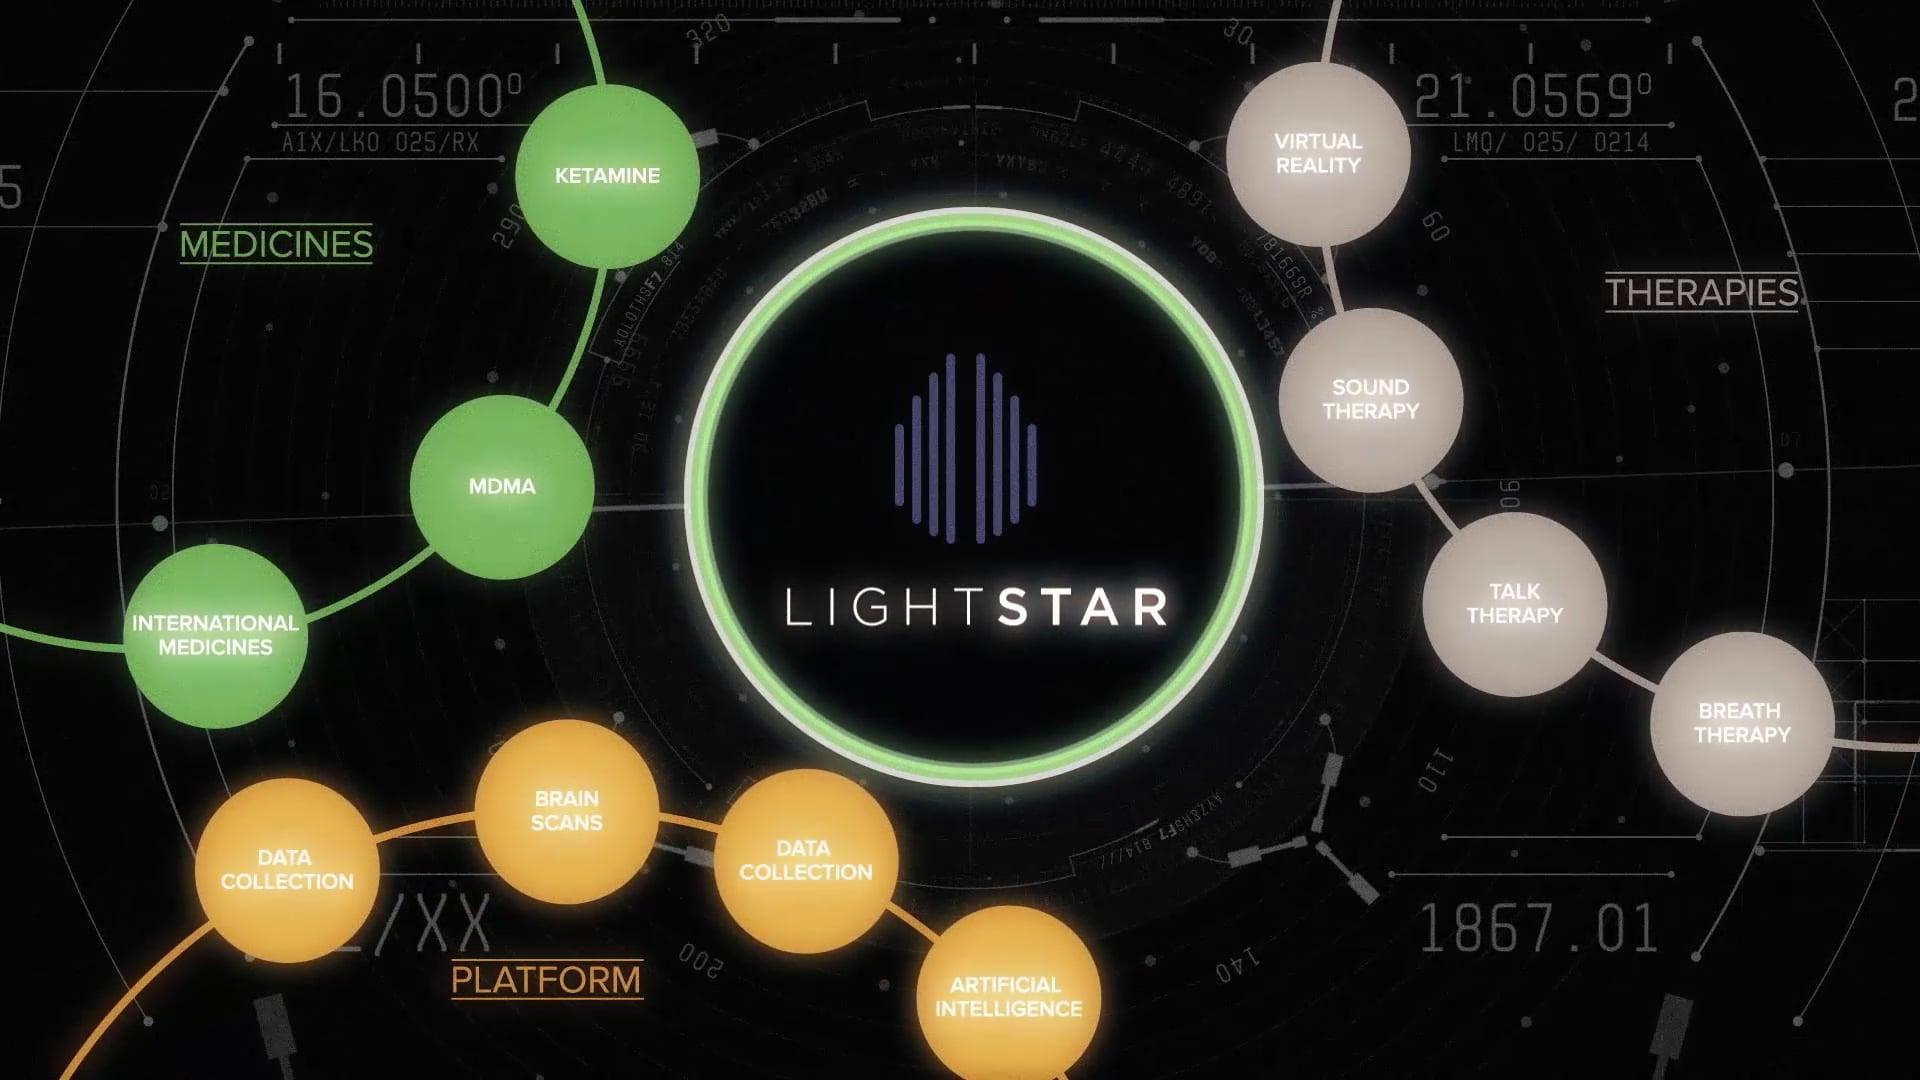 Lightstar - Medical Infomercial